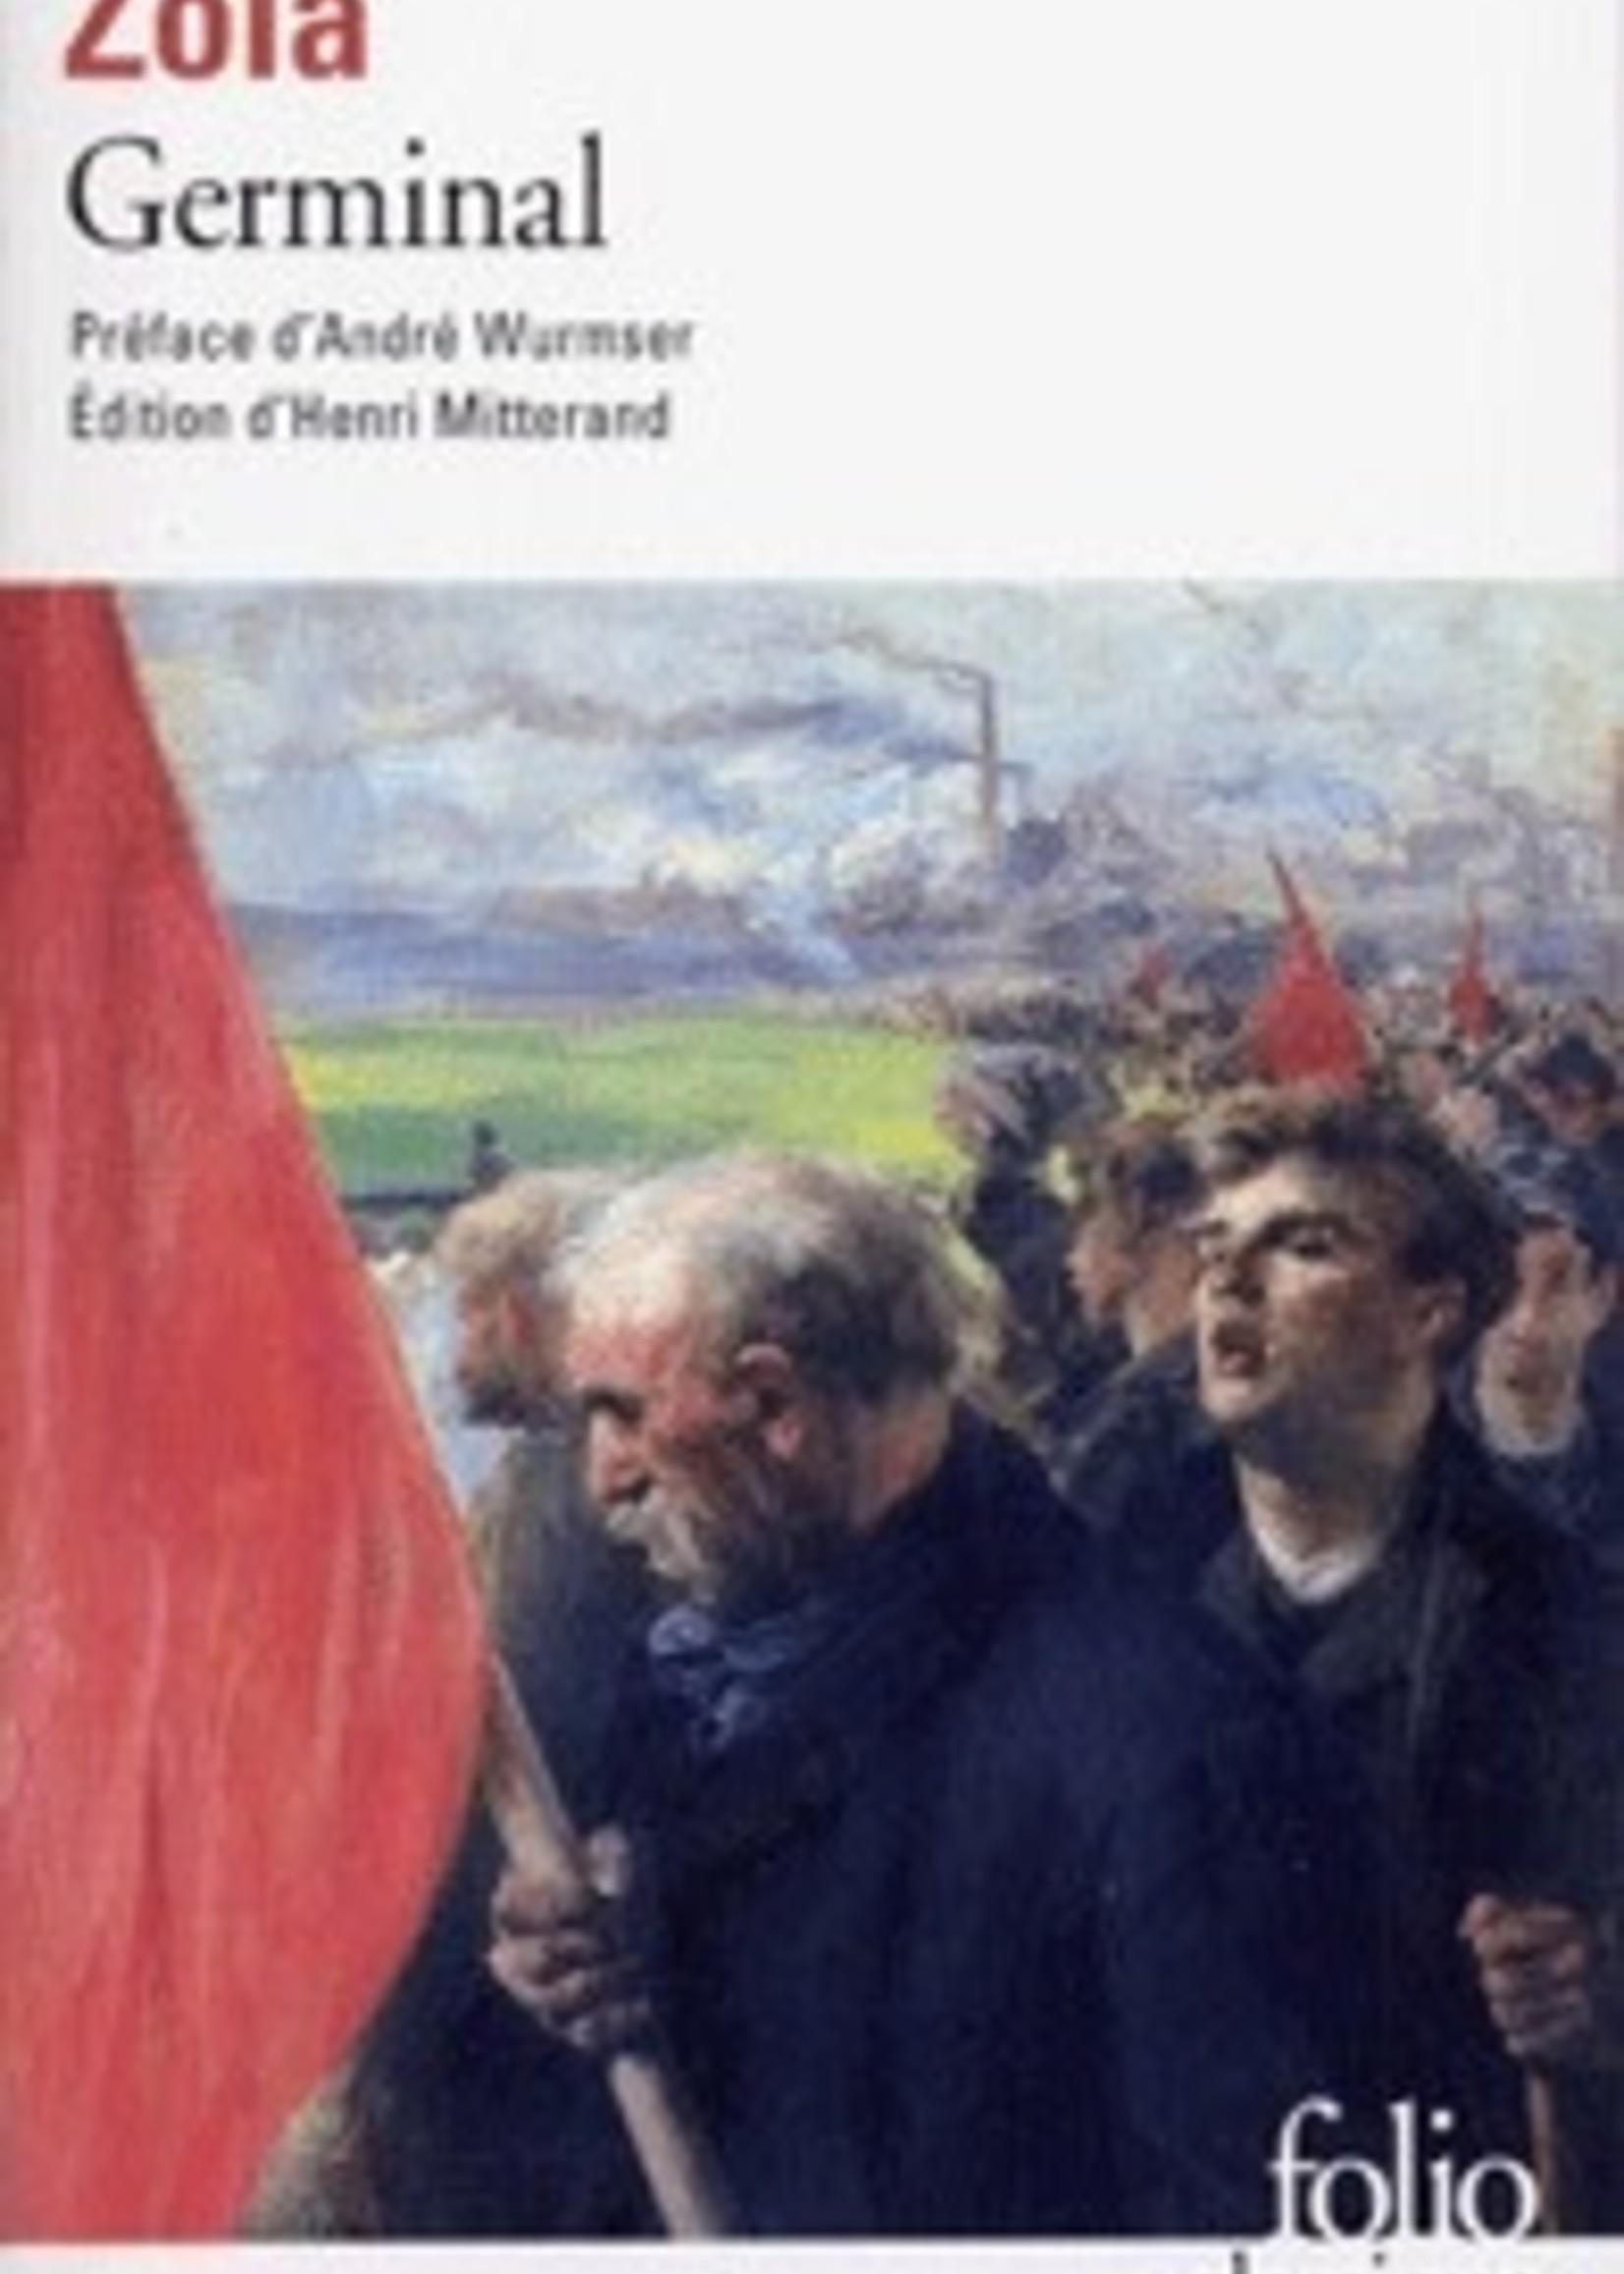 Germinal by Émile Zola